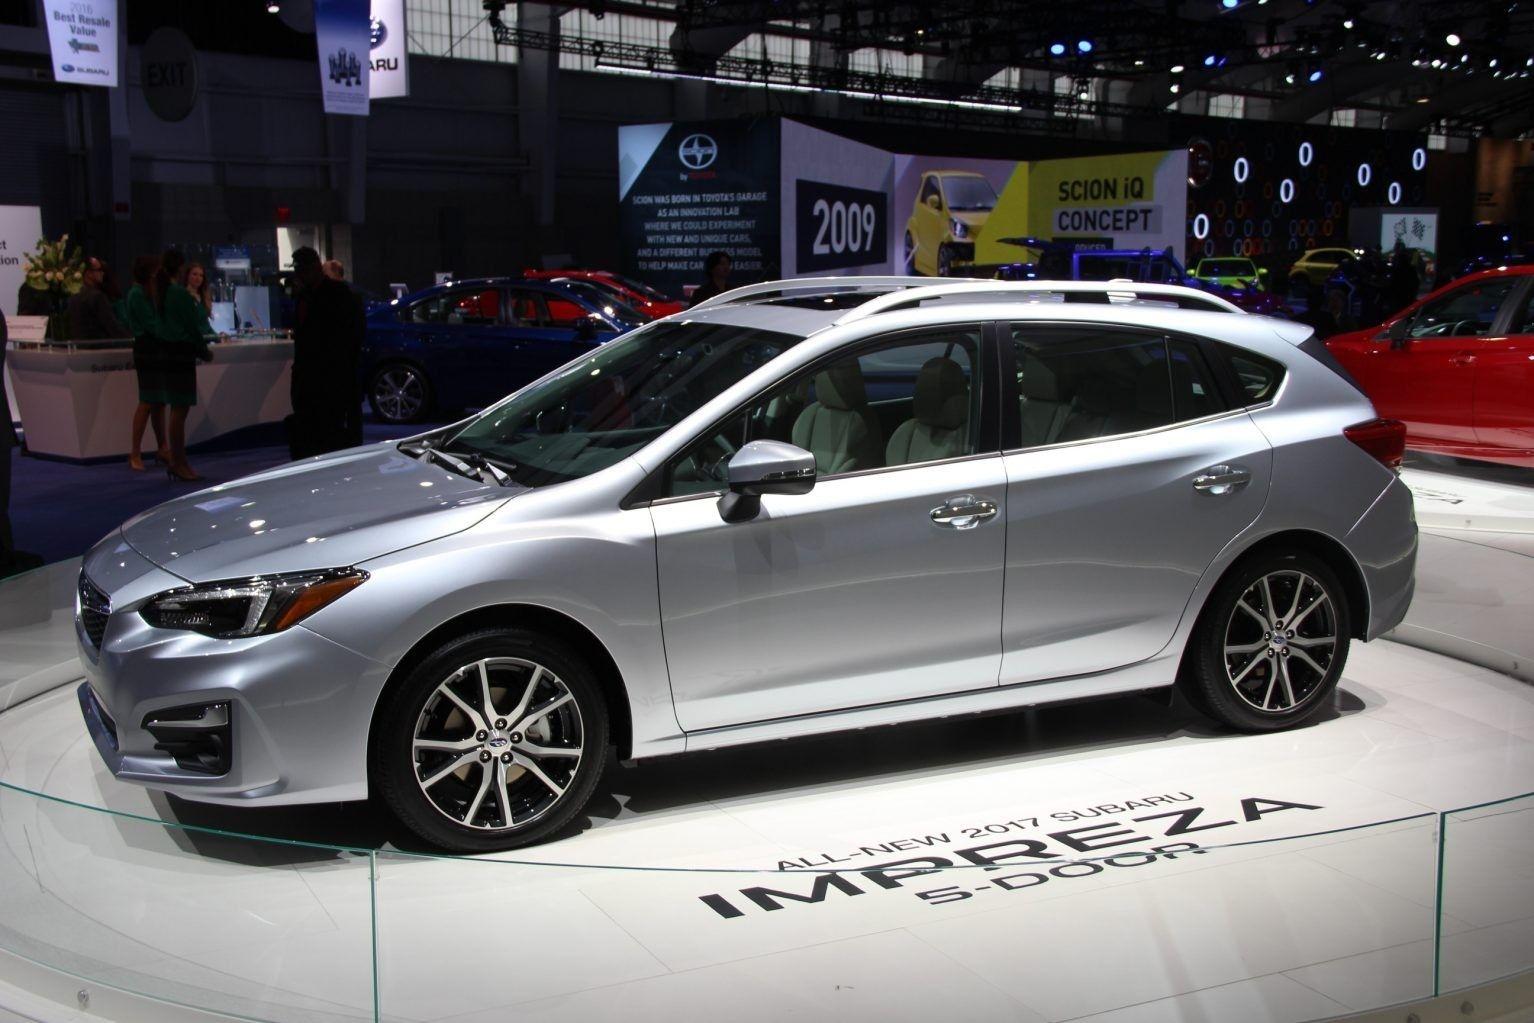 2019 Subaru Sti Hatchback Review and Specs Subaru sti